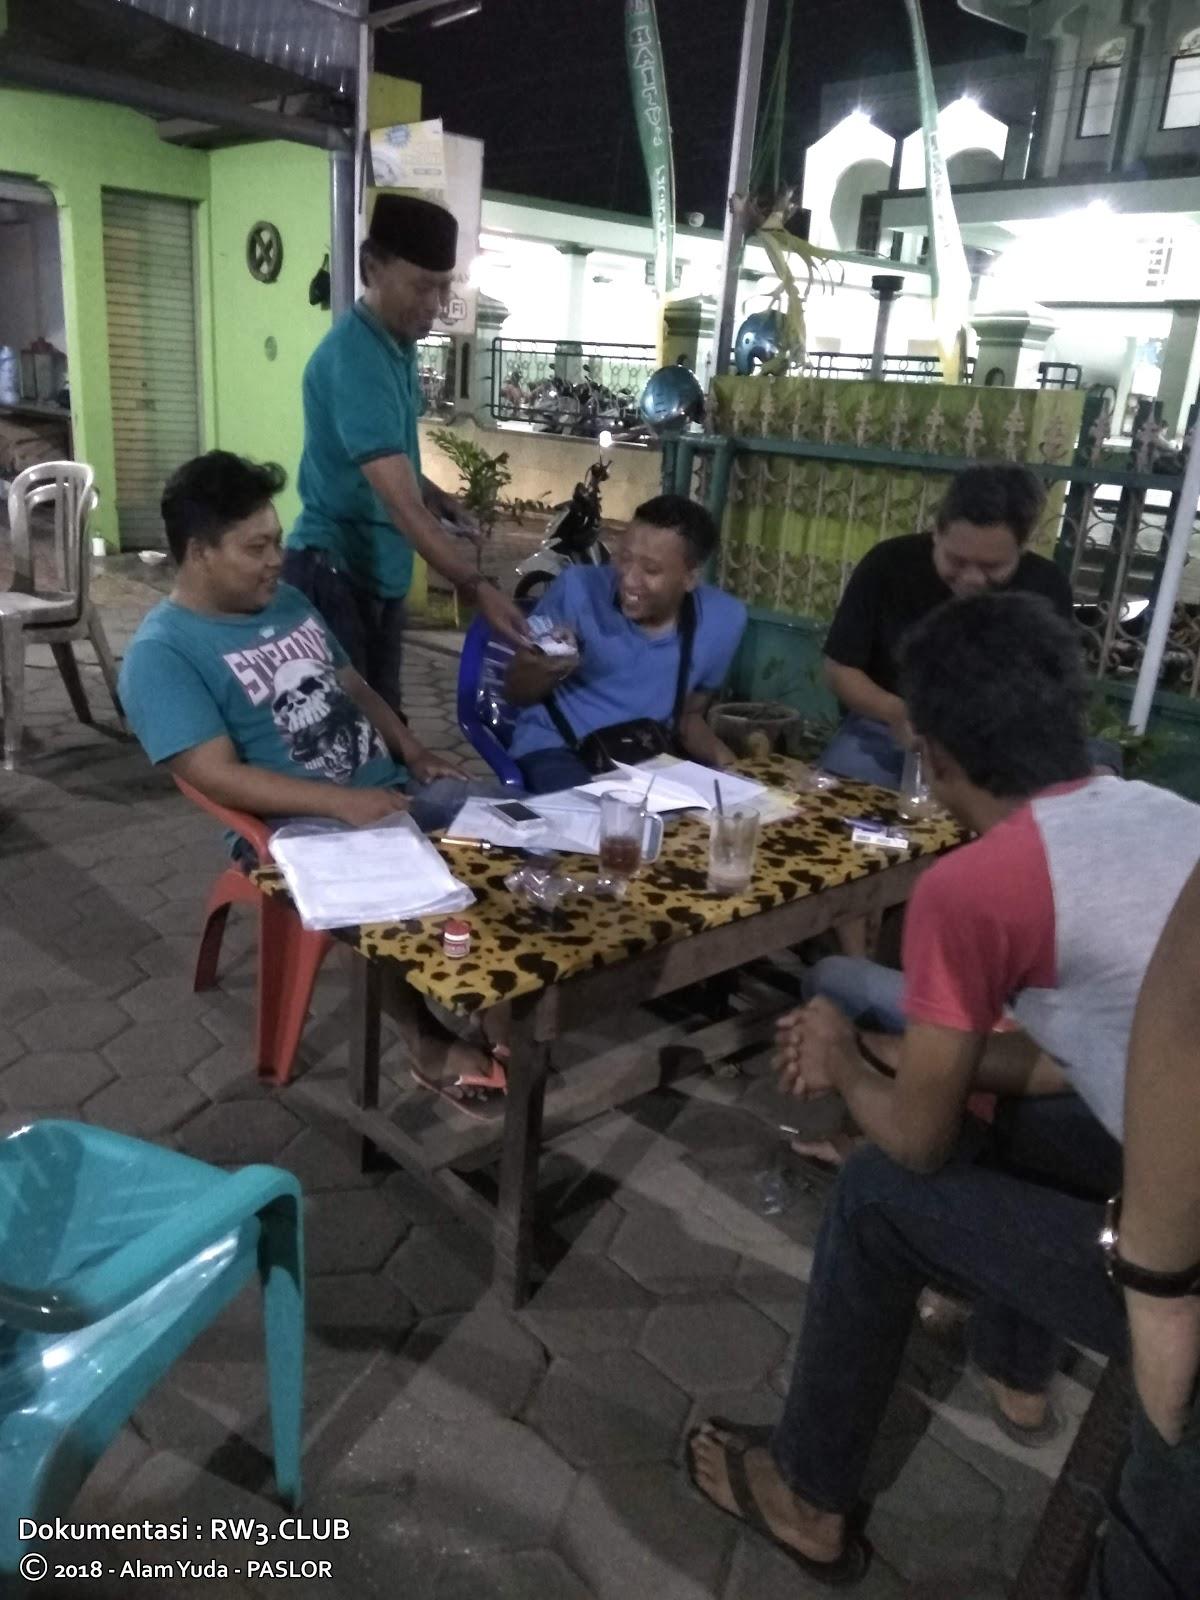 Nor Badri, Raditya Nugroho, Imam Sofyan, Andi Mulyadi, Didik Setiyawan Prasetiyo - Pengurus Komunitas Pemuda-Pemudi RW-3 NgoPi di Angkringan